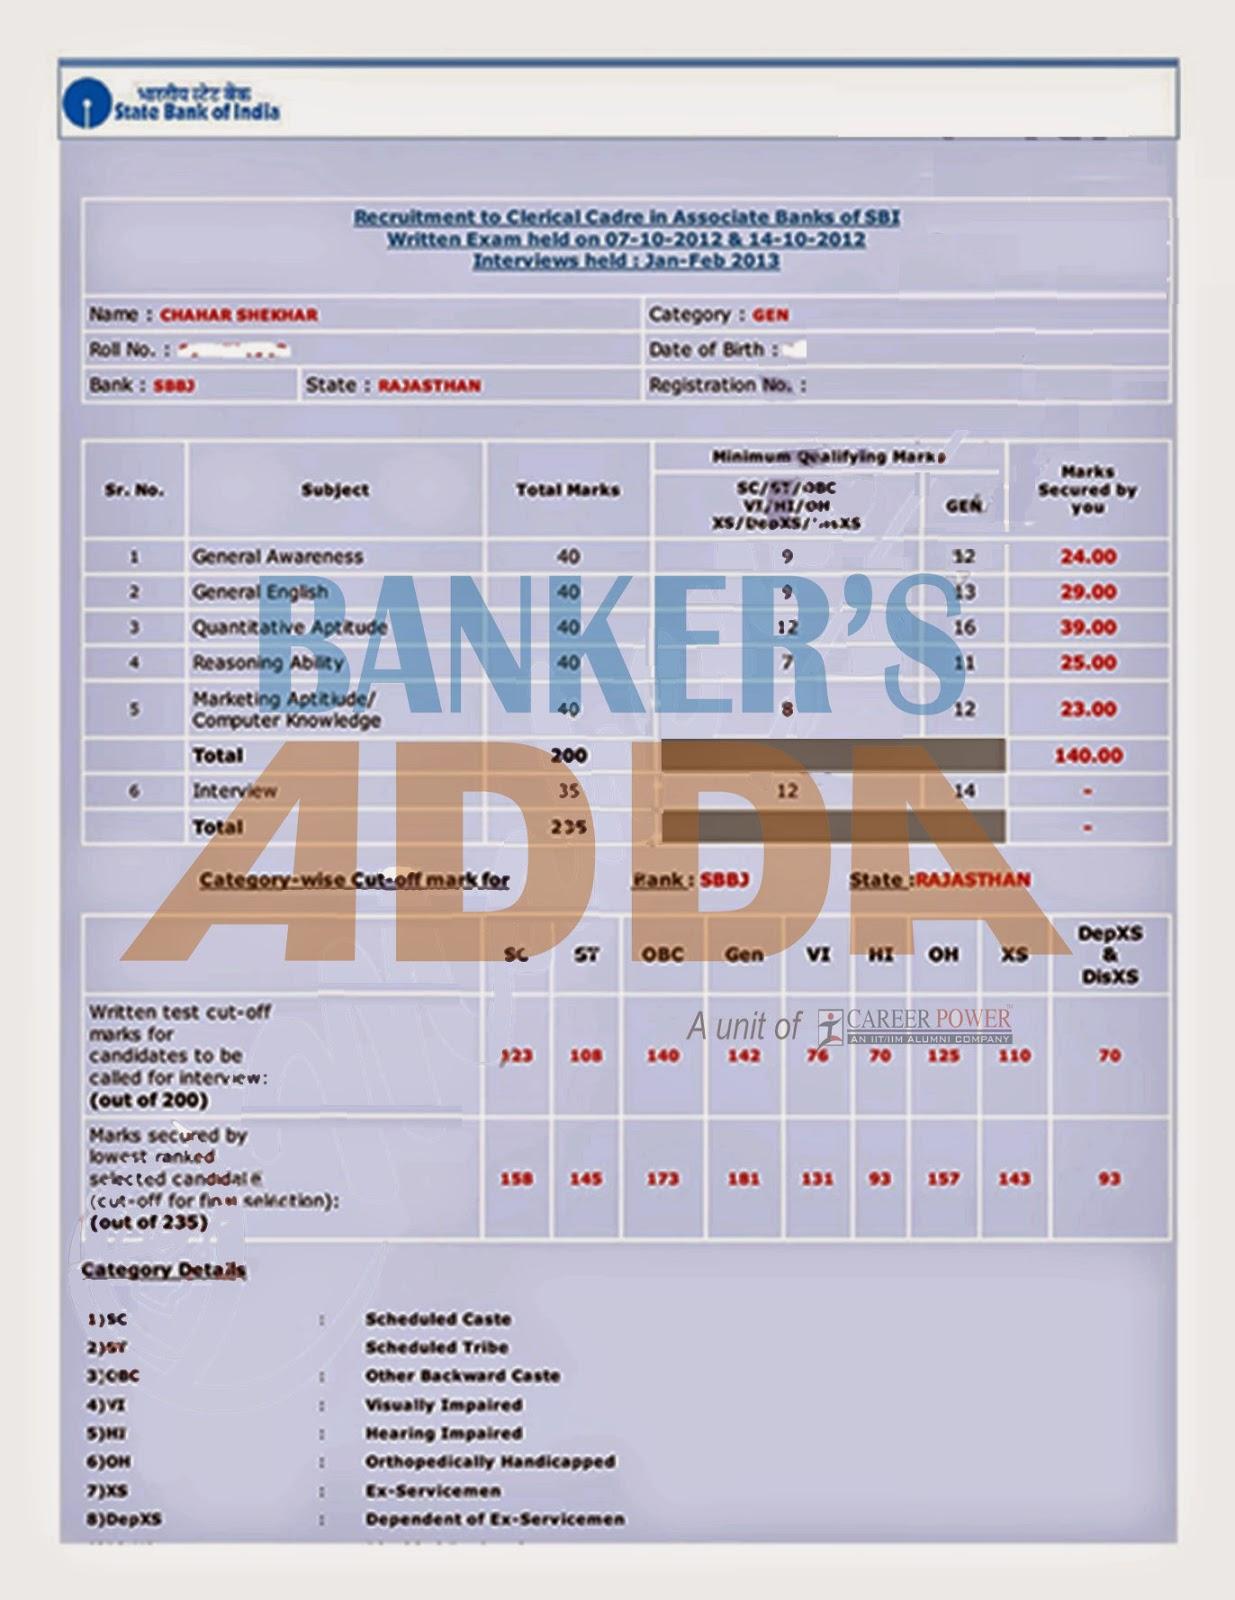 verify bank ifsc code